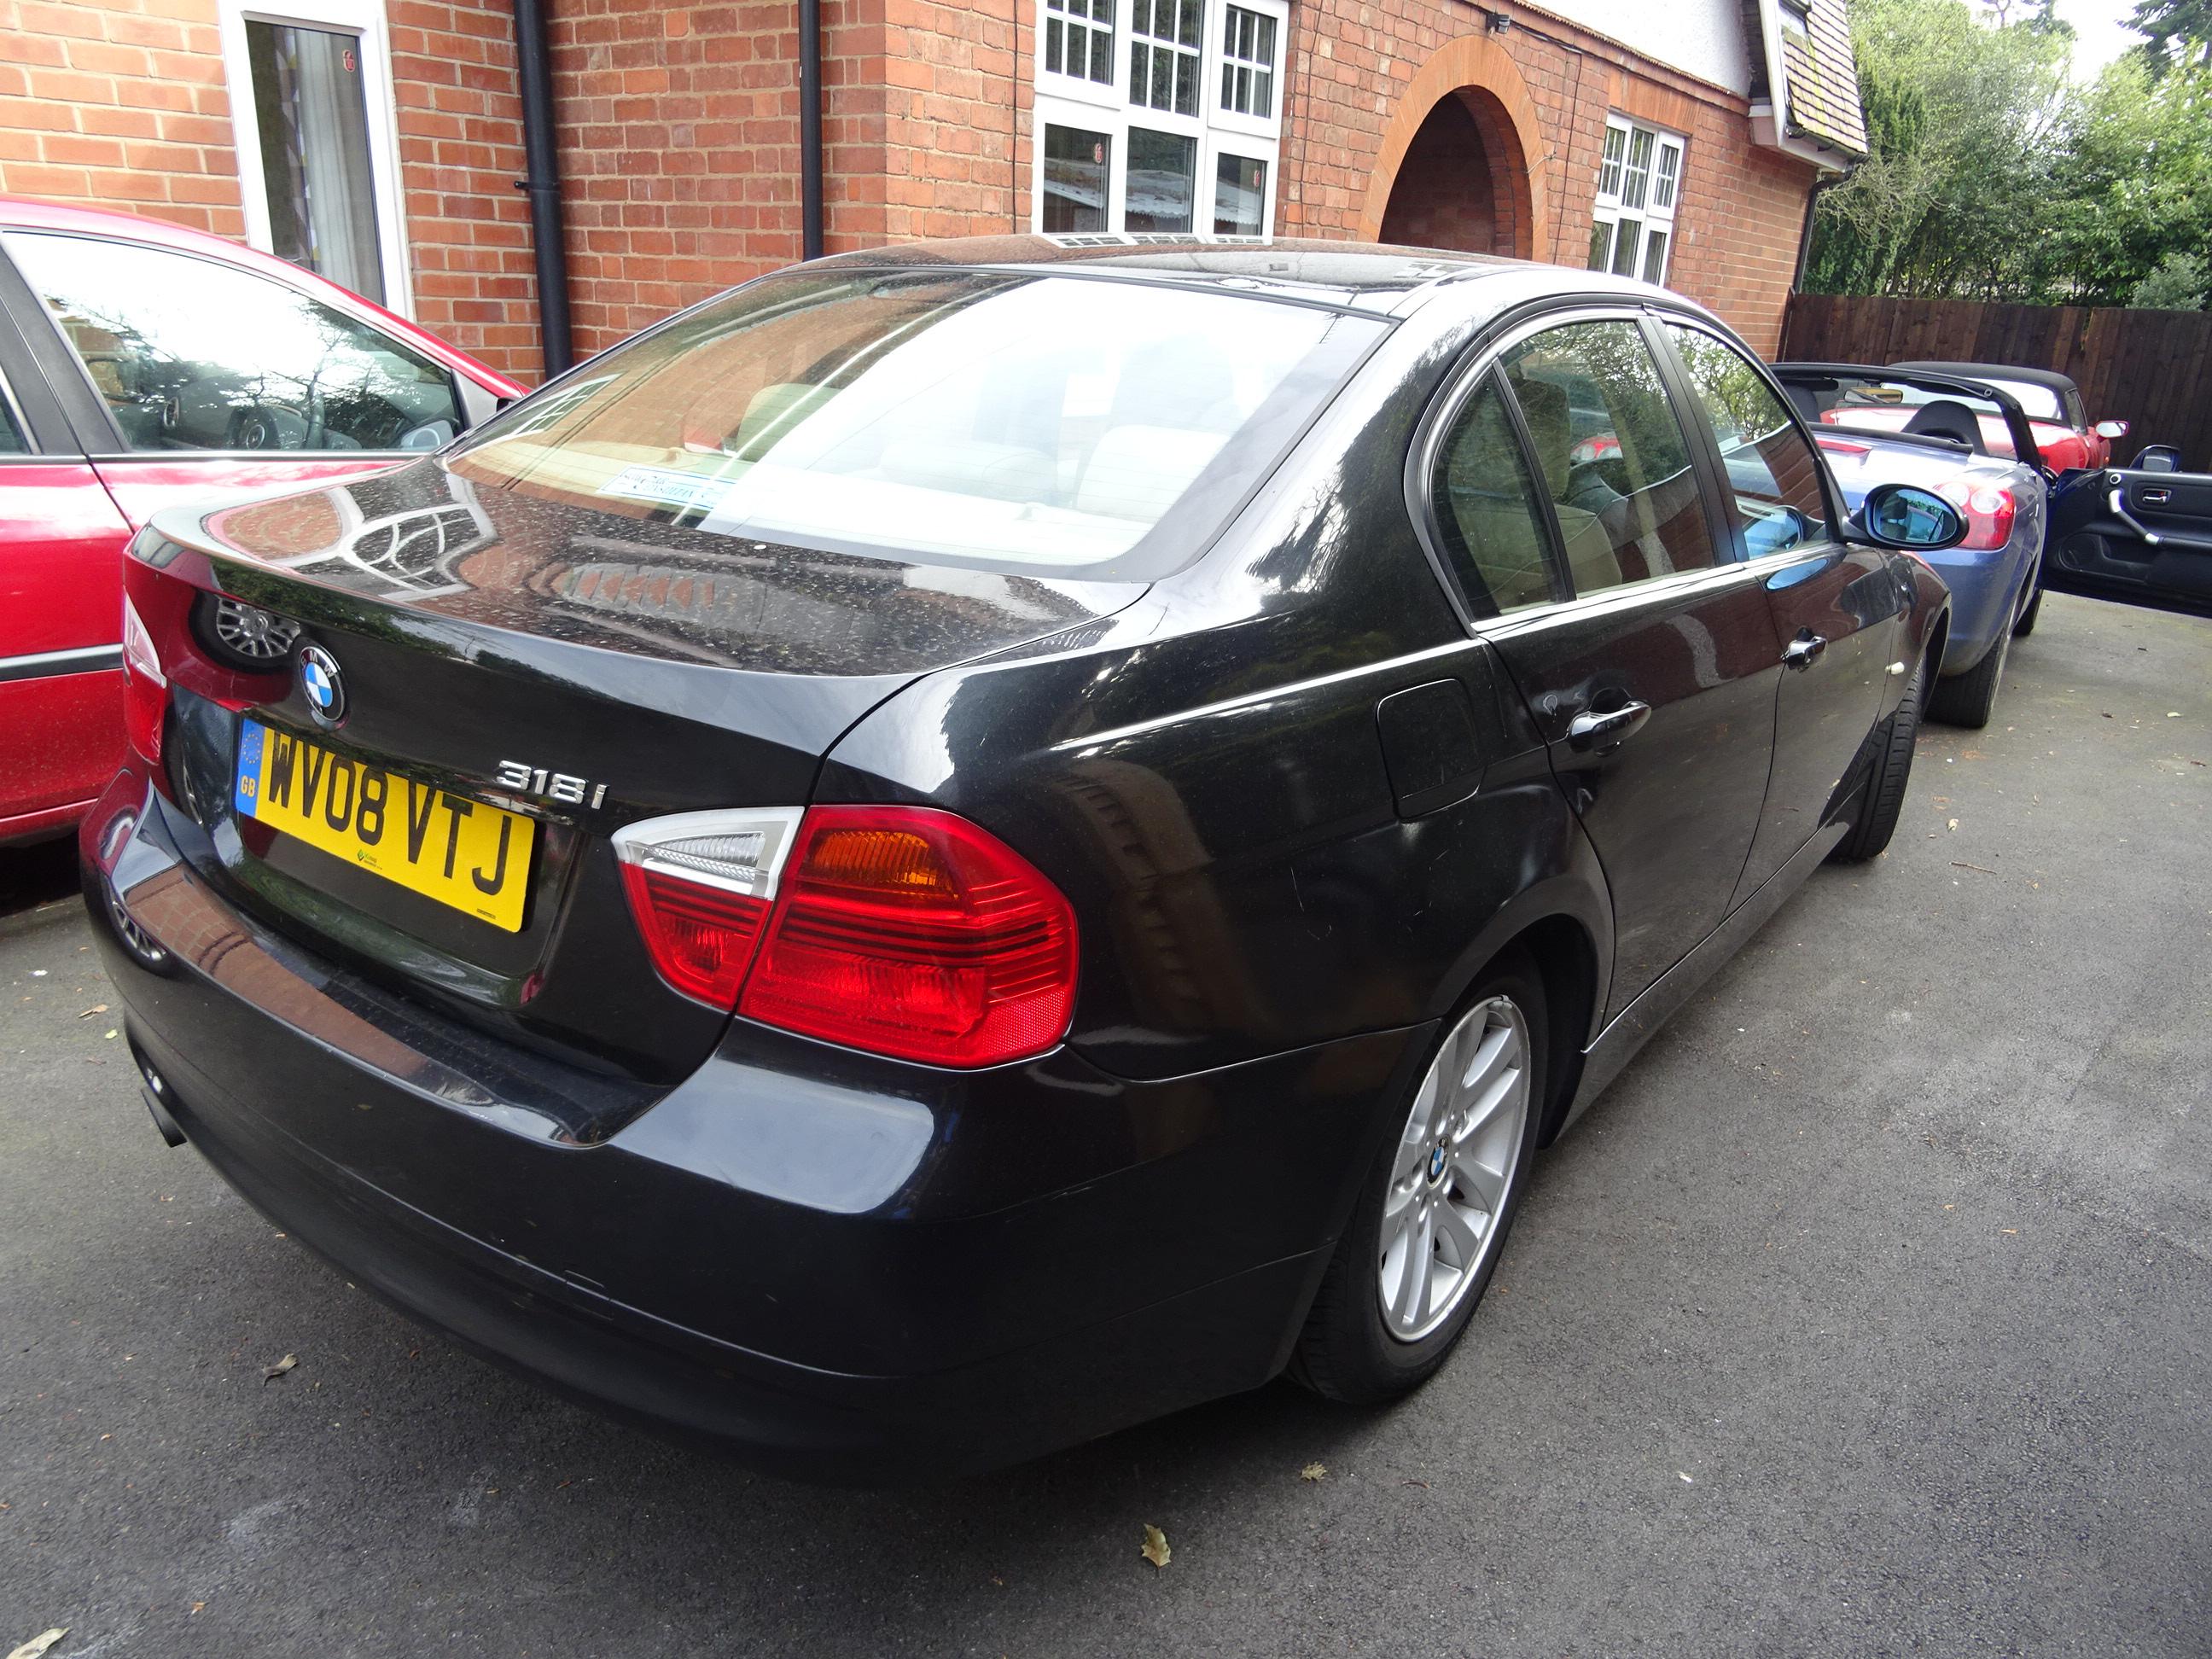 BMW 318i ES 4 door manual 2008 08, 68000 miles